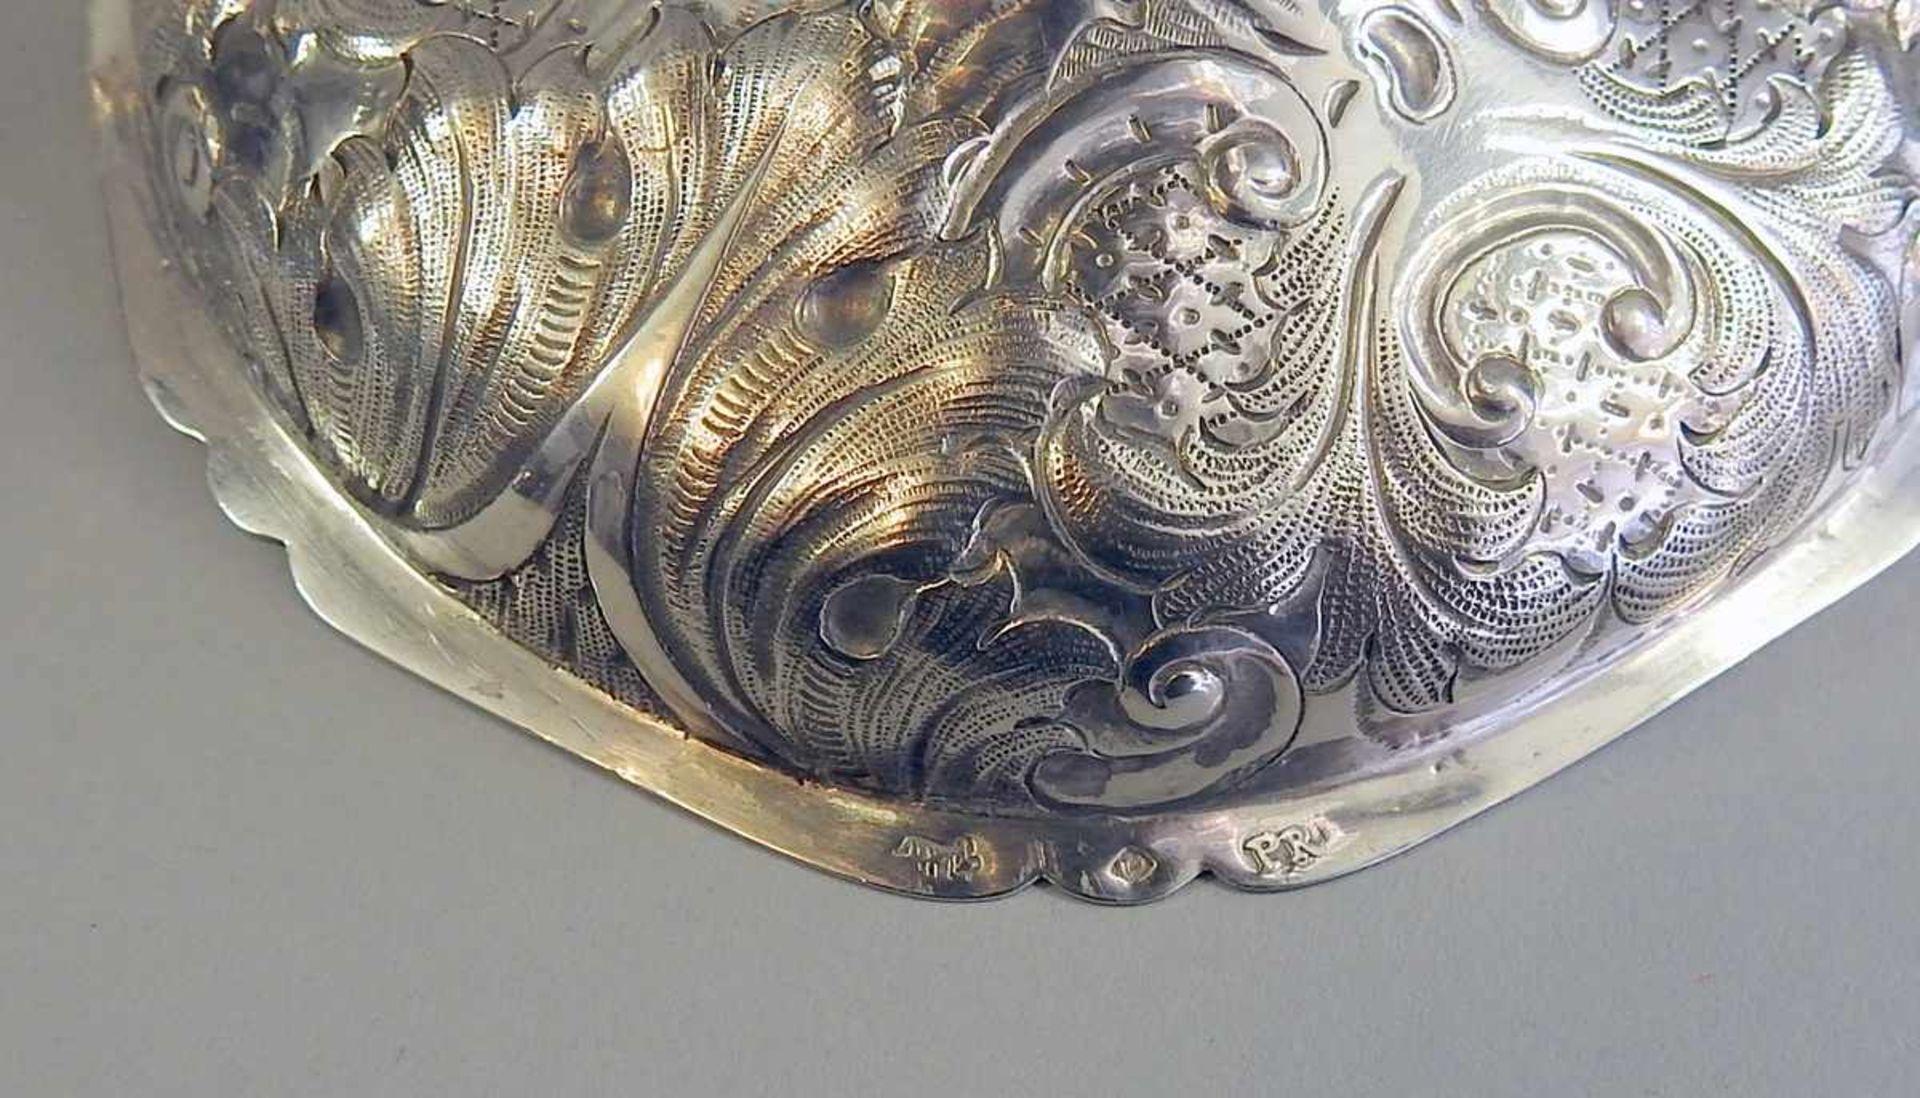 Los 13 - Deckelpokal, Peter Rohde, geboren Danzig 1670 - 1675 Silber, punziert am Bodenrand und am